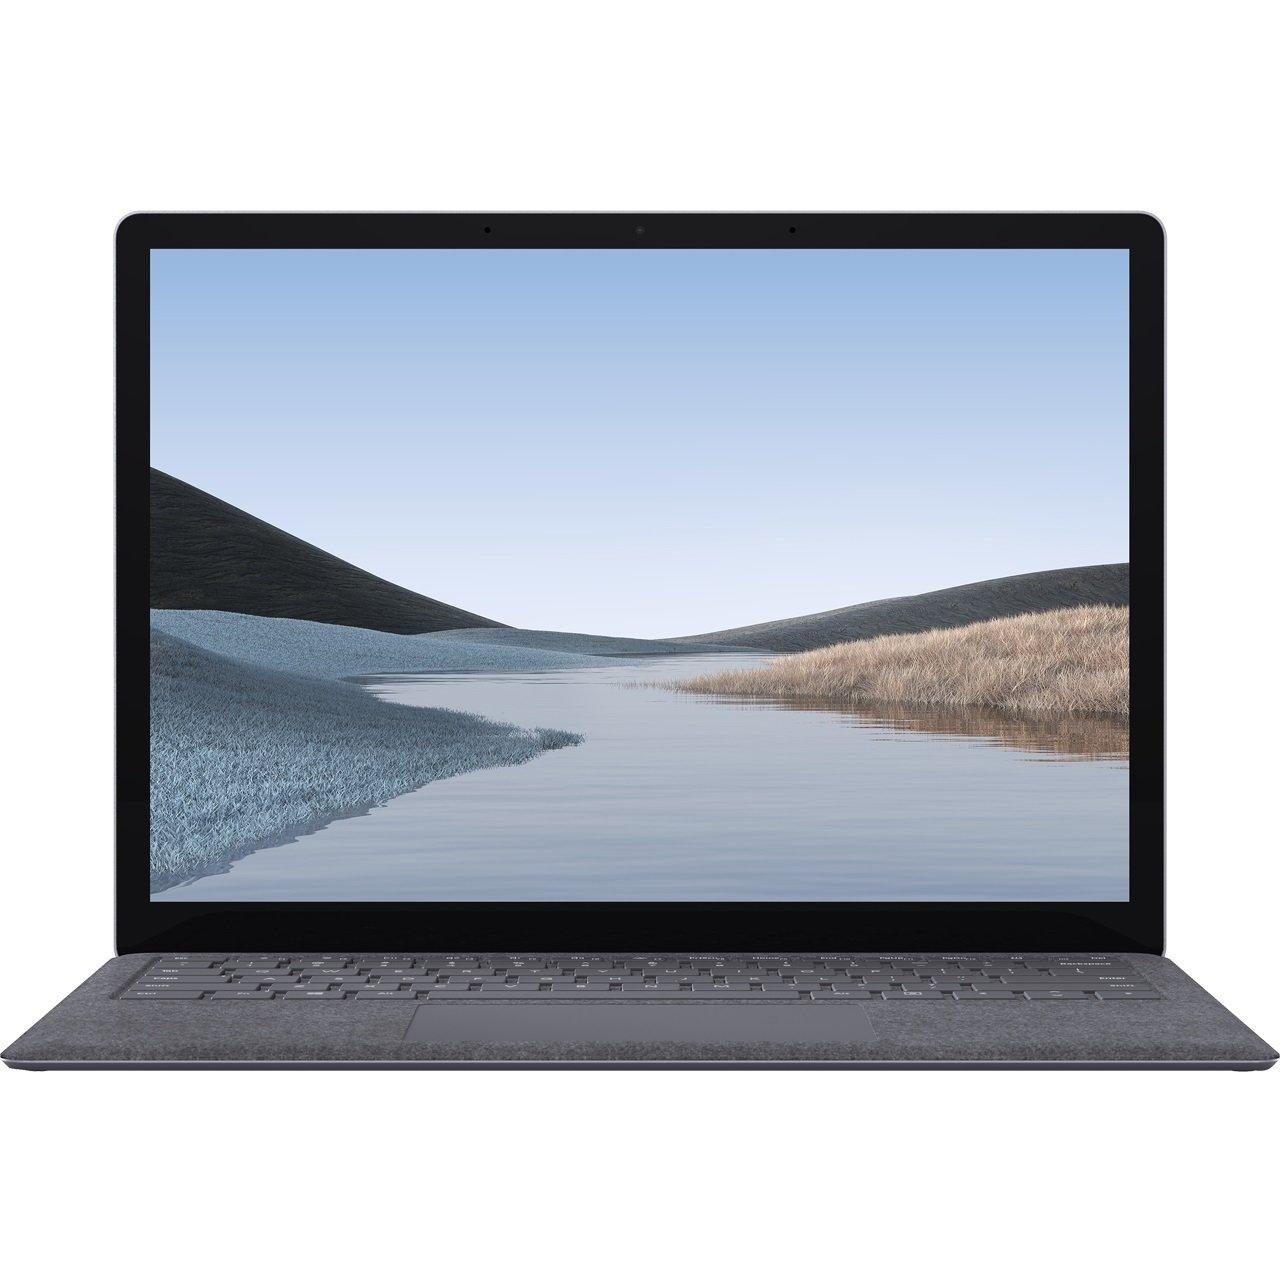 Microsoft Surface Laptop 3 13.5in i7 16GB 256GB - Platinum